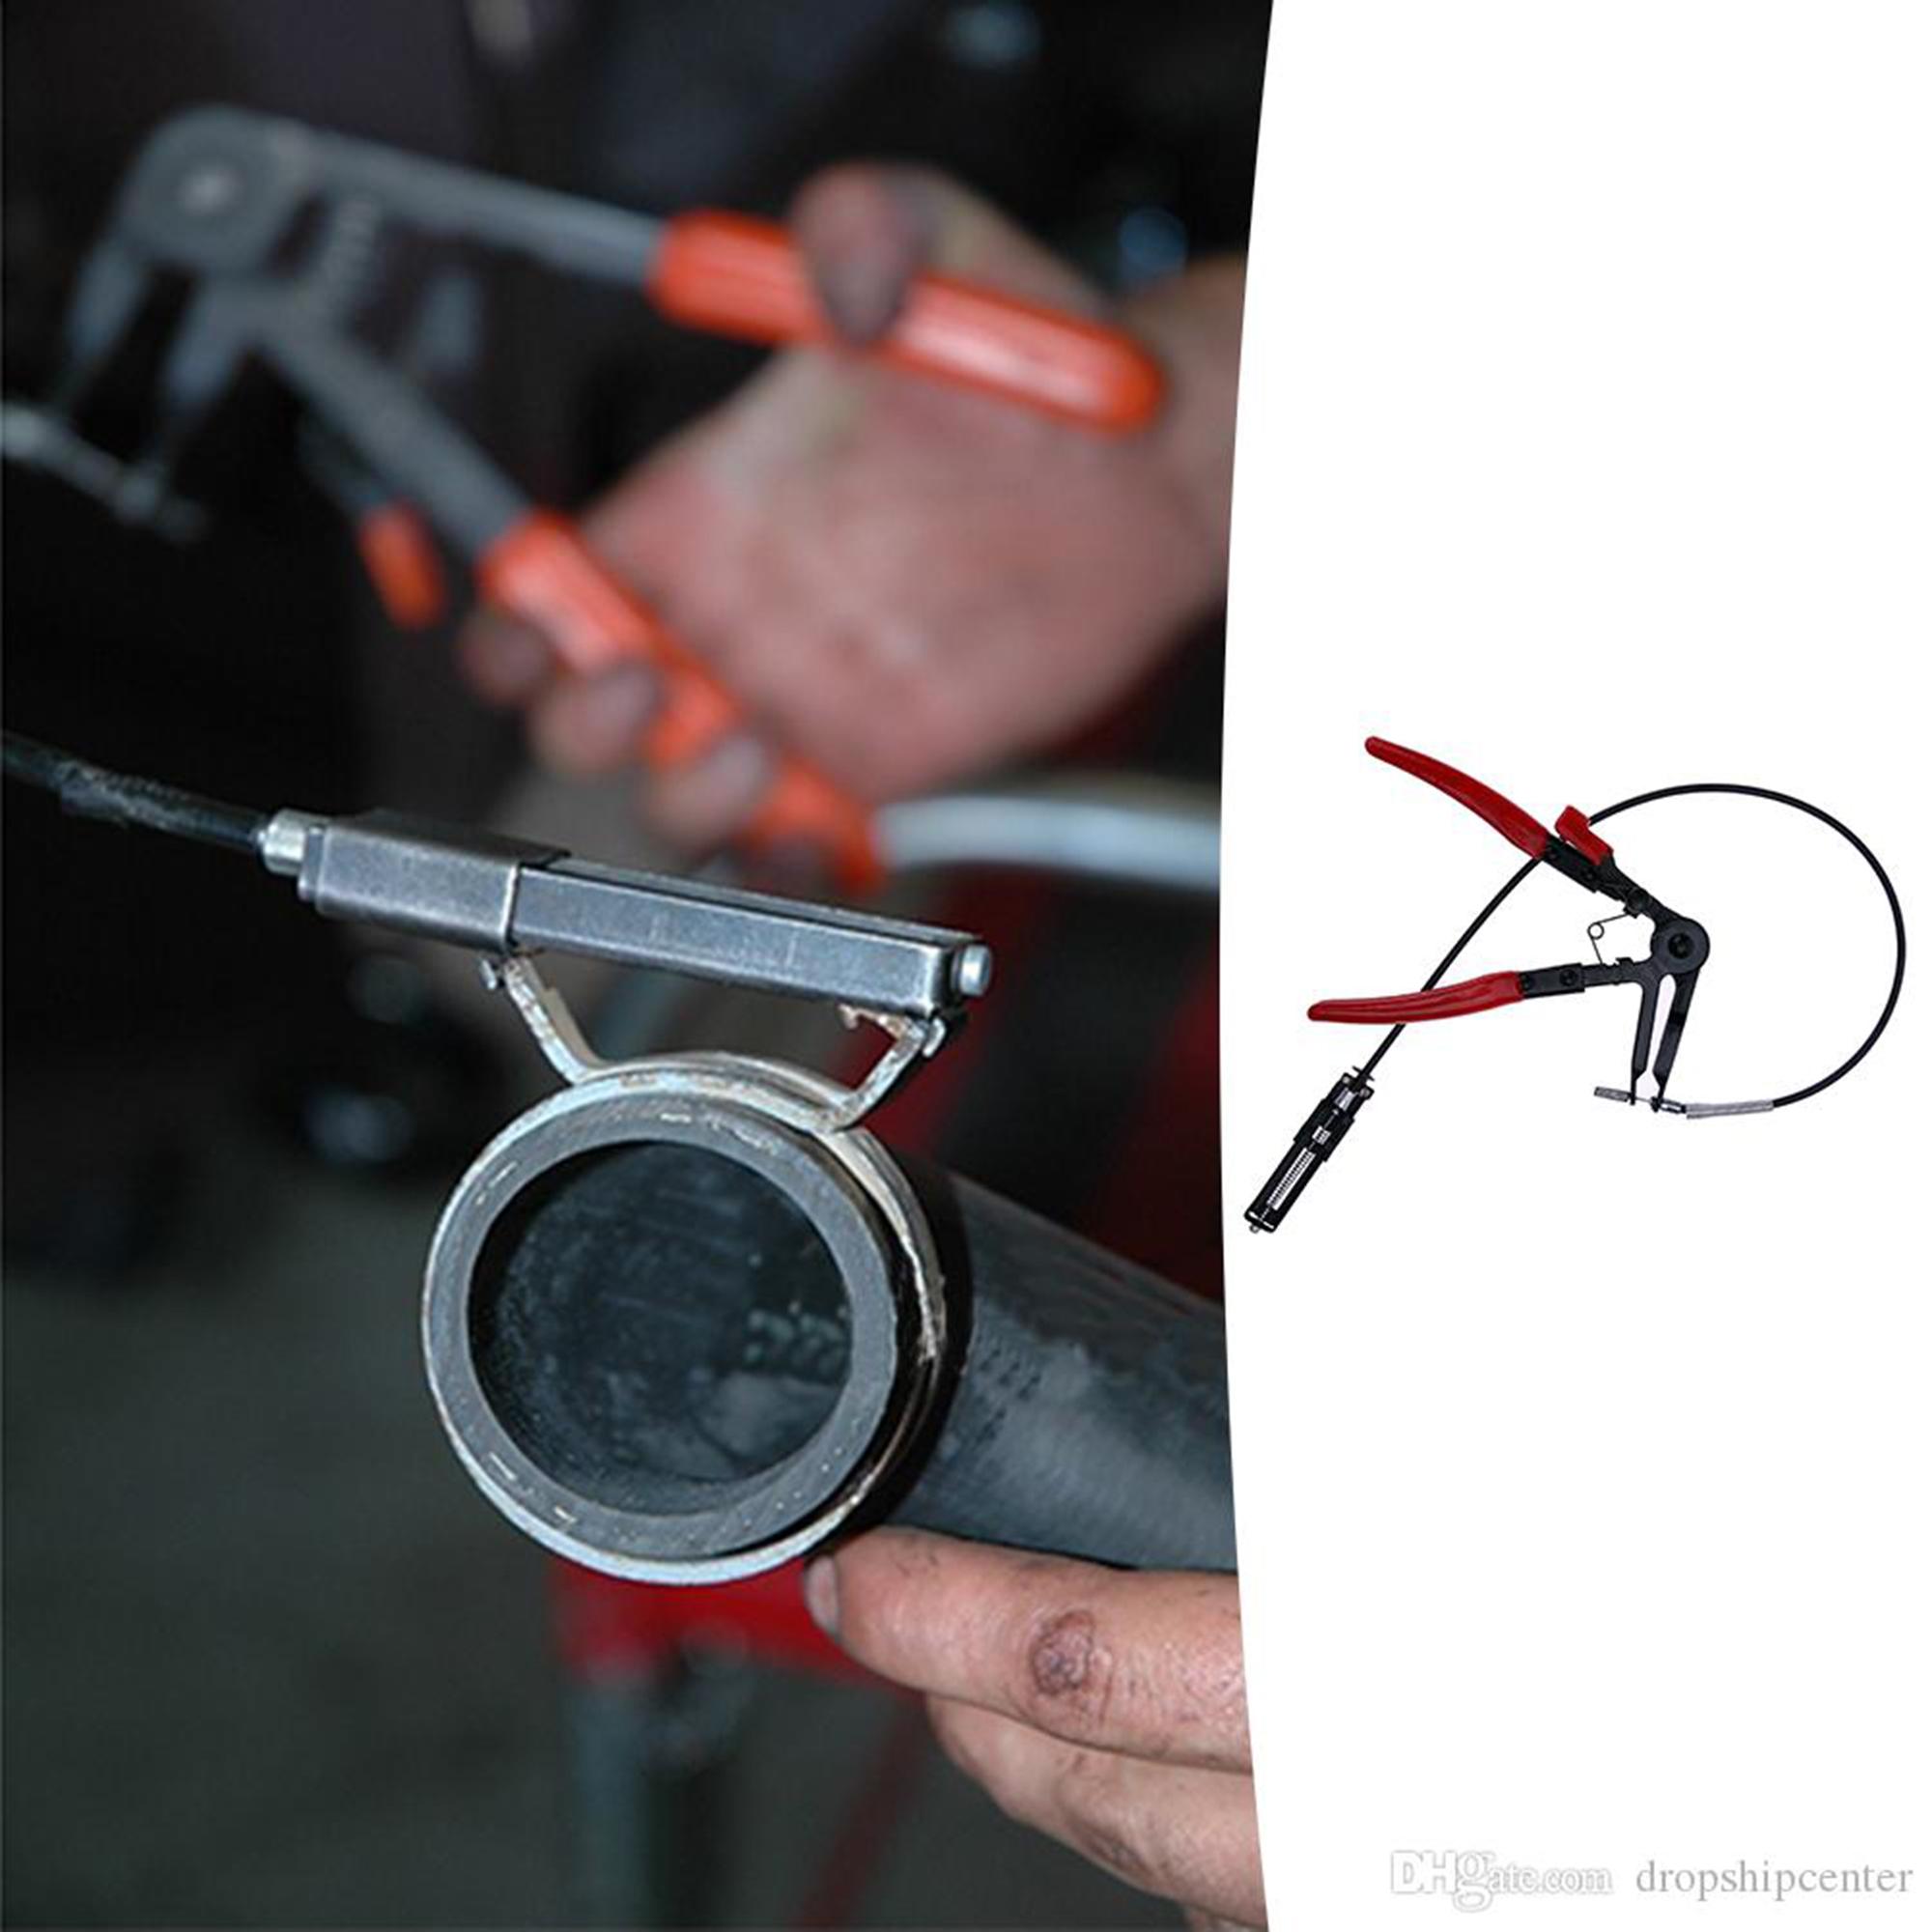 hose-clamp-flexible-w96k56.jpg